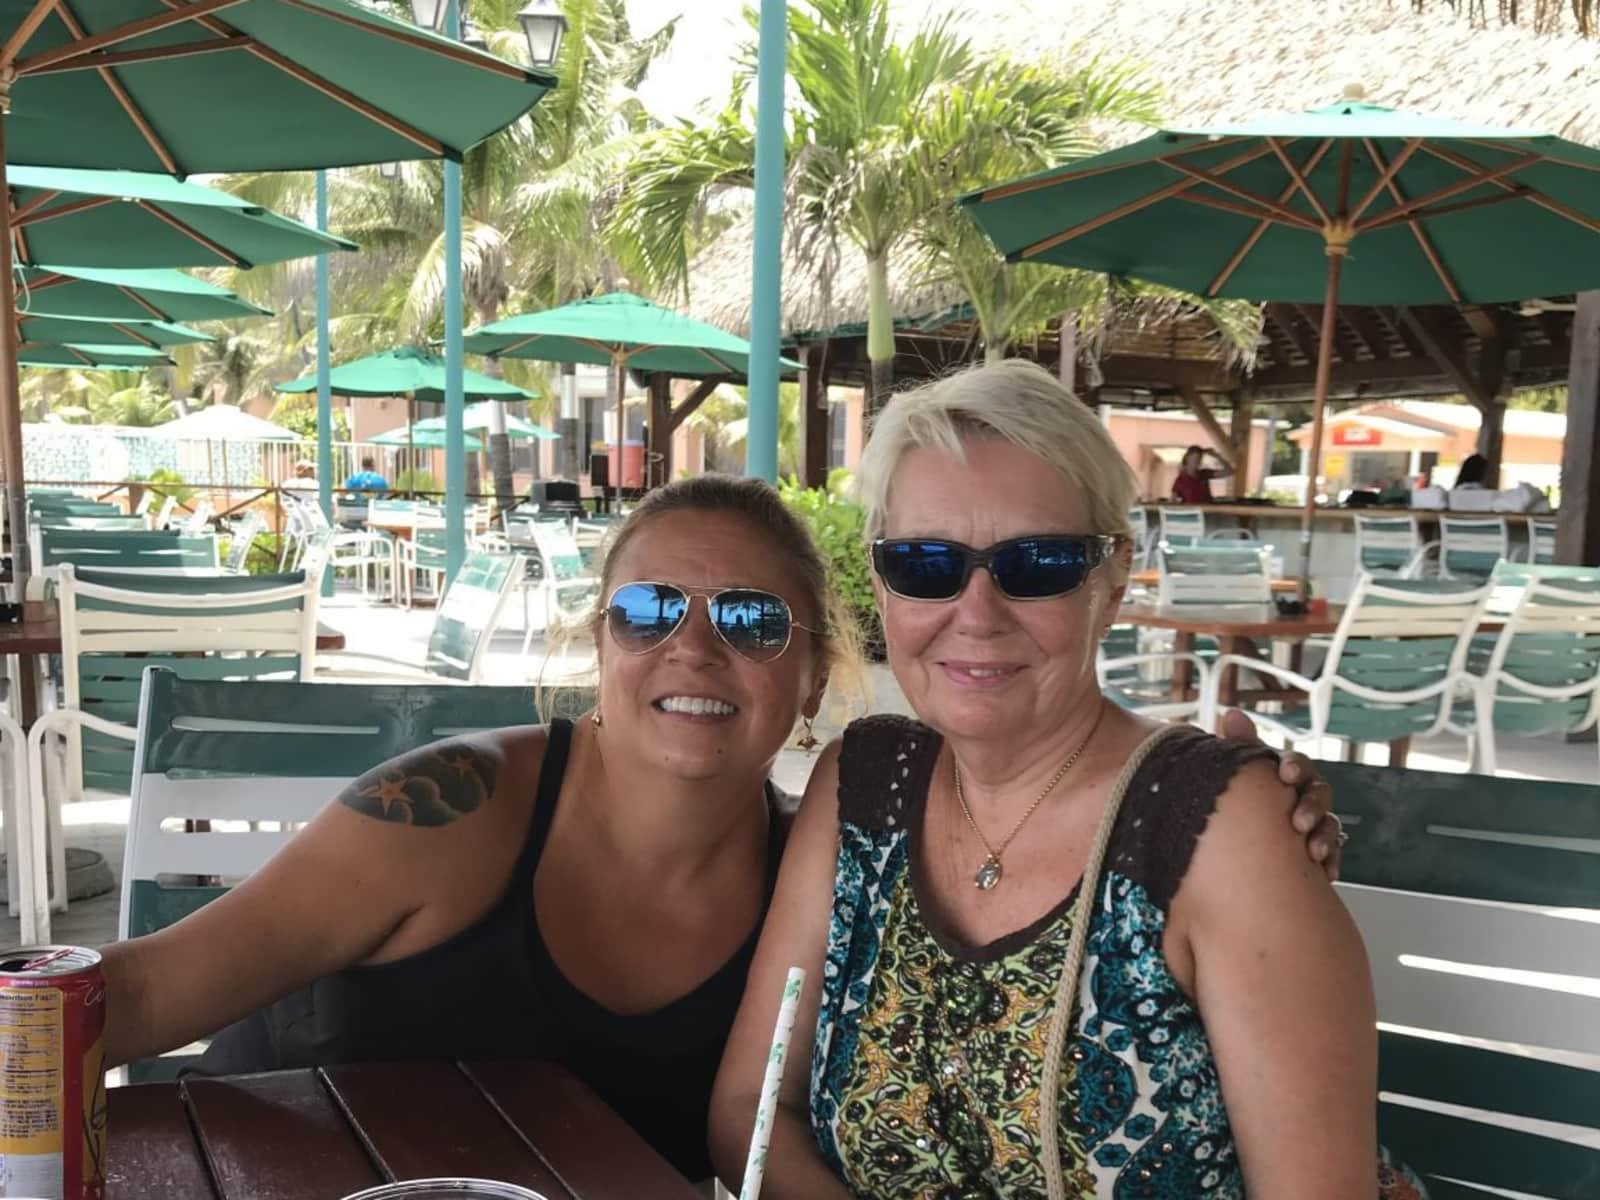 Anita & John from Dallas, Texas, United States